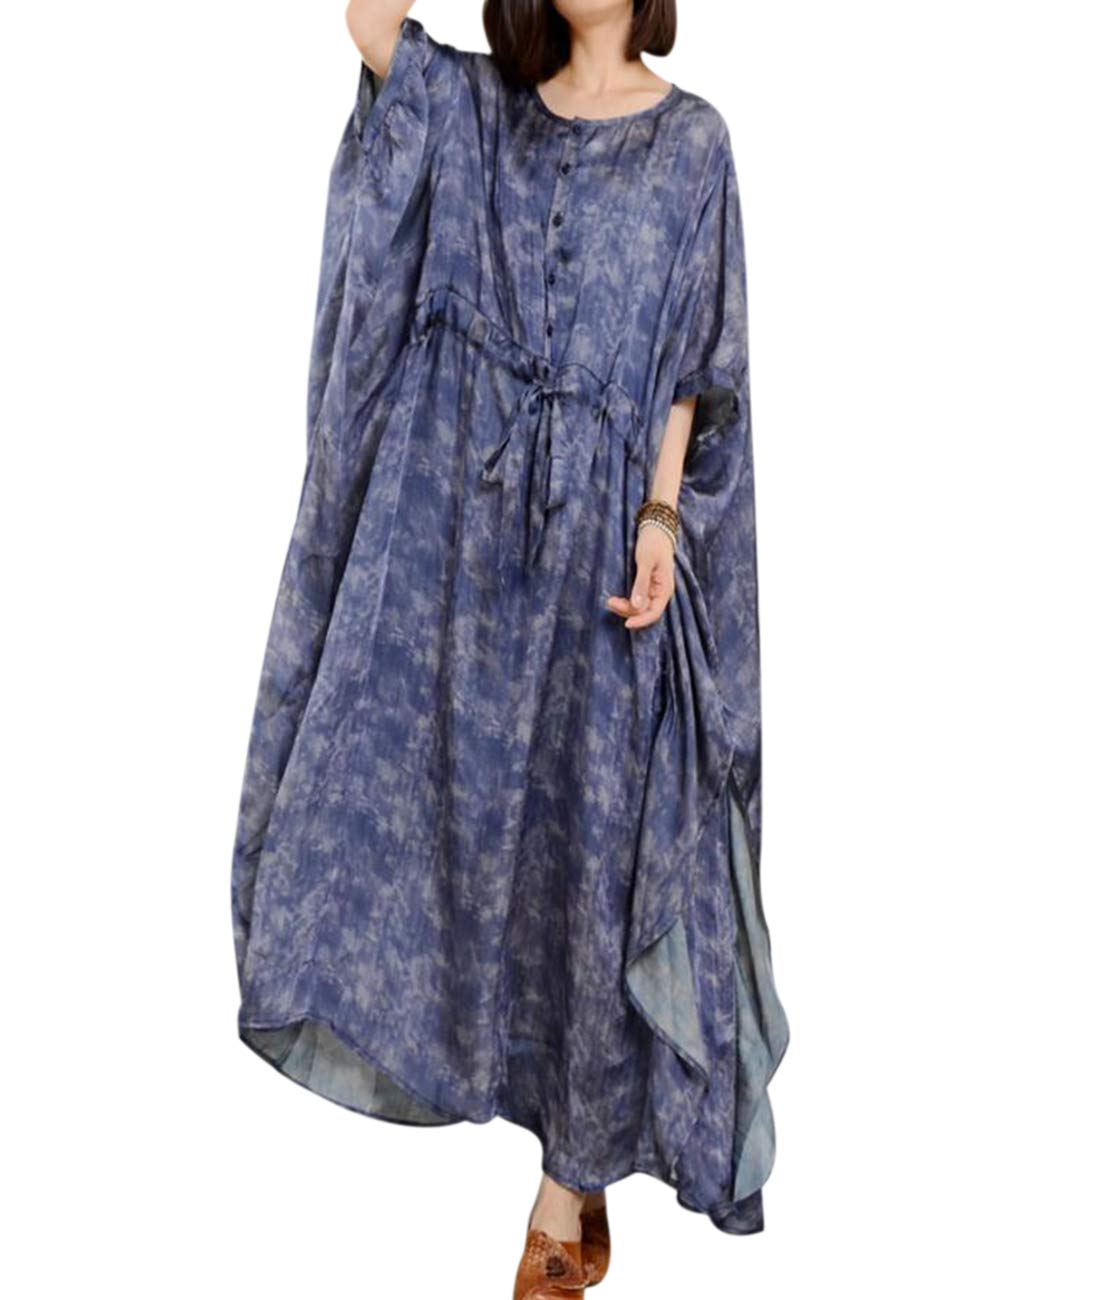 YESNO JO4 Women Long Loose Printed Dress 100% Silk Bohemia Plus Size Kimono Sleeve Drawstring Waist Flutter Sides